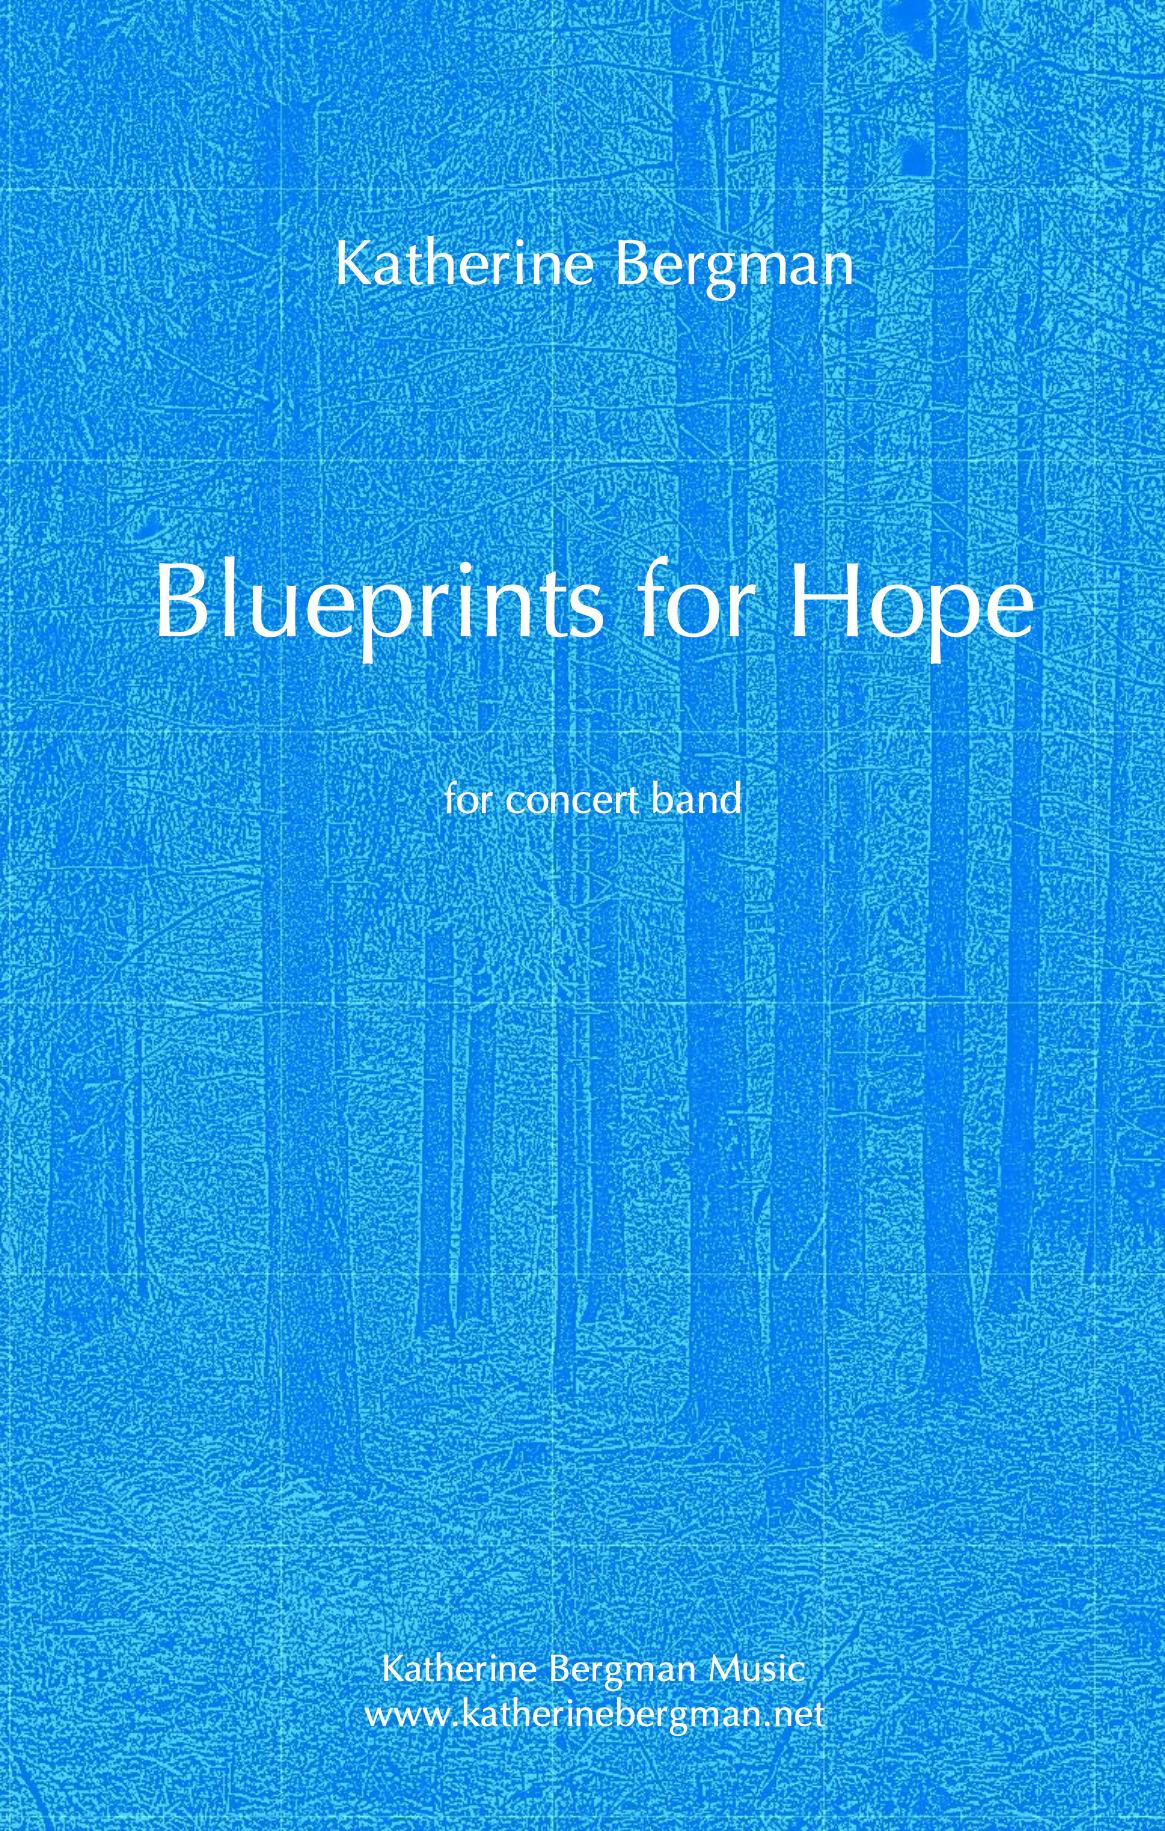 Blueprints For Hope by Katherine Bergman